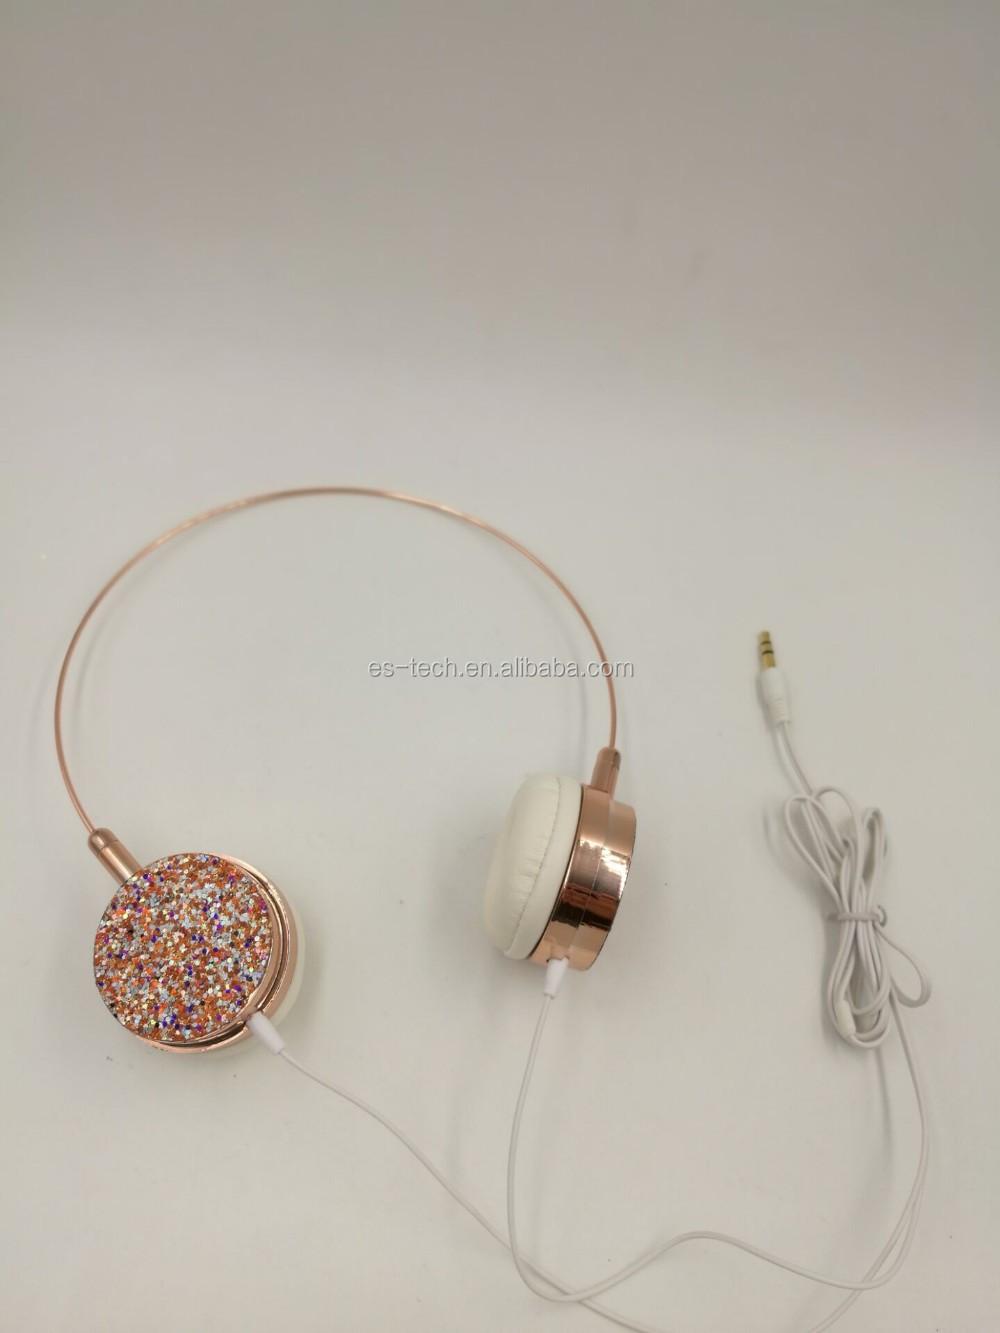 2017 Rose Gold Wired Cat Headphones Headset Glitter Headphone - Buy ...